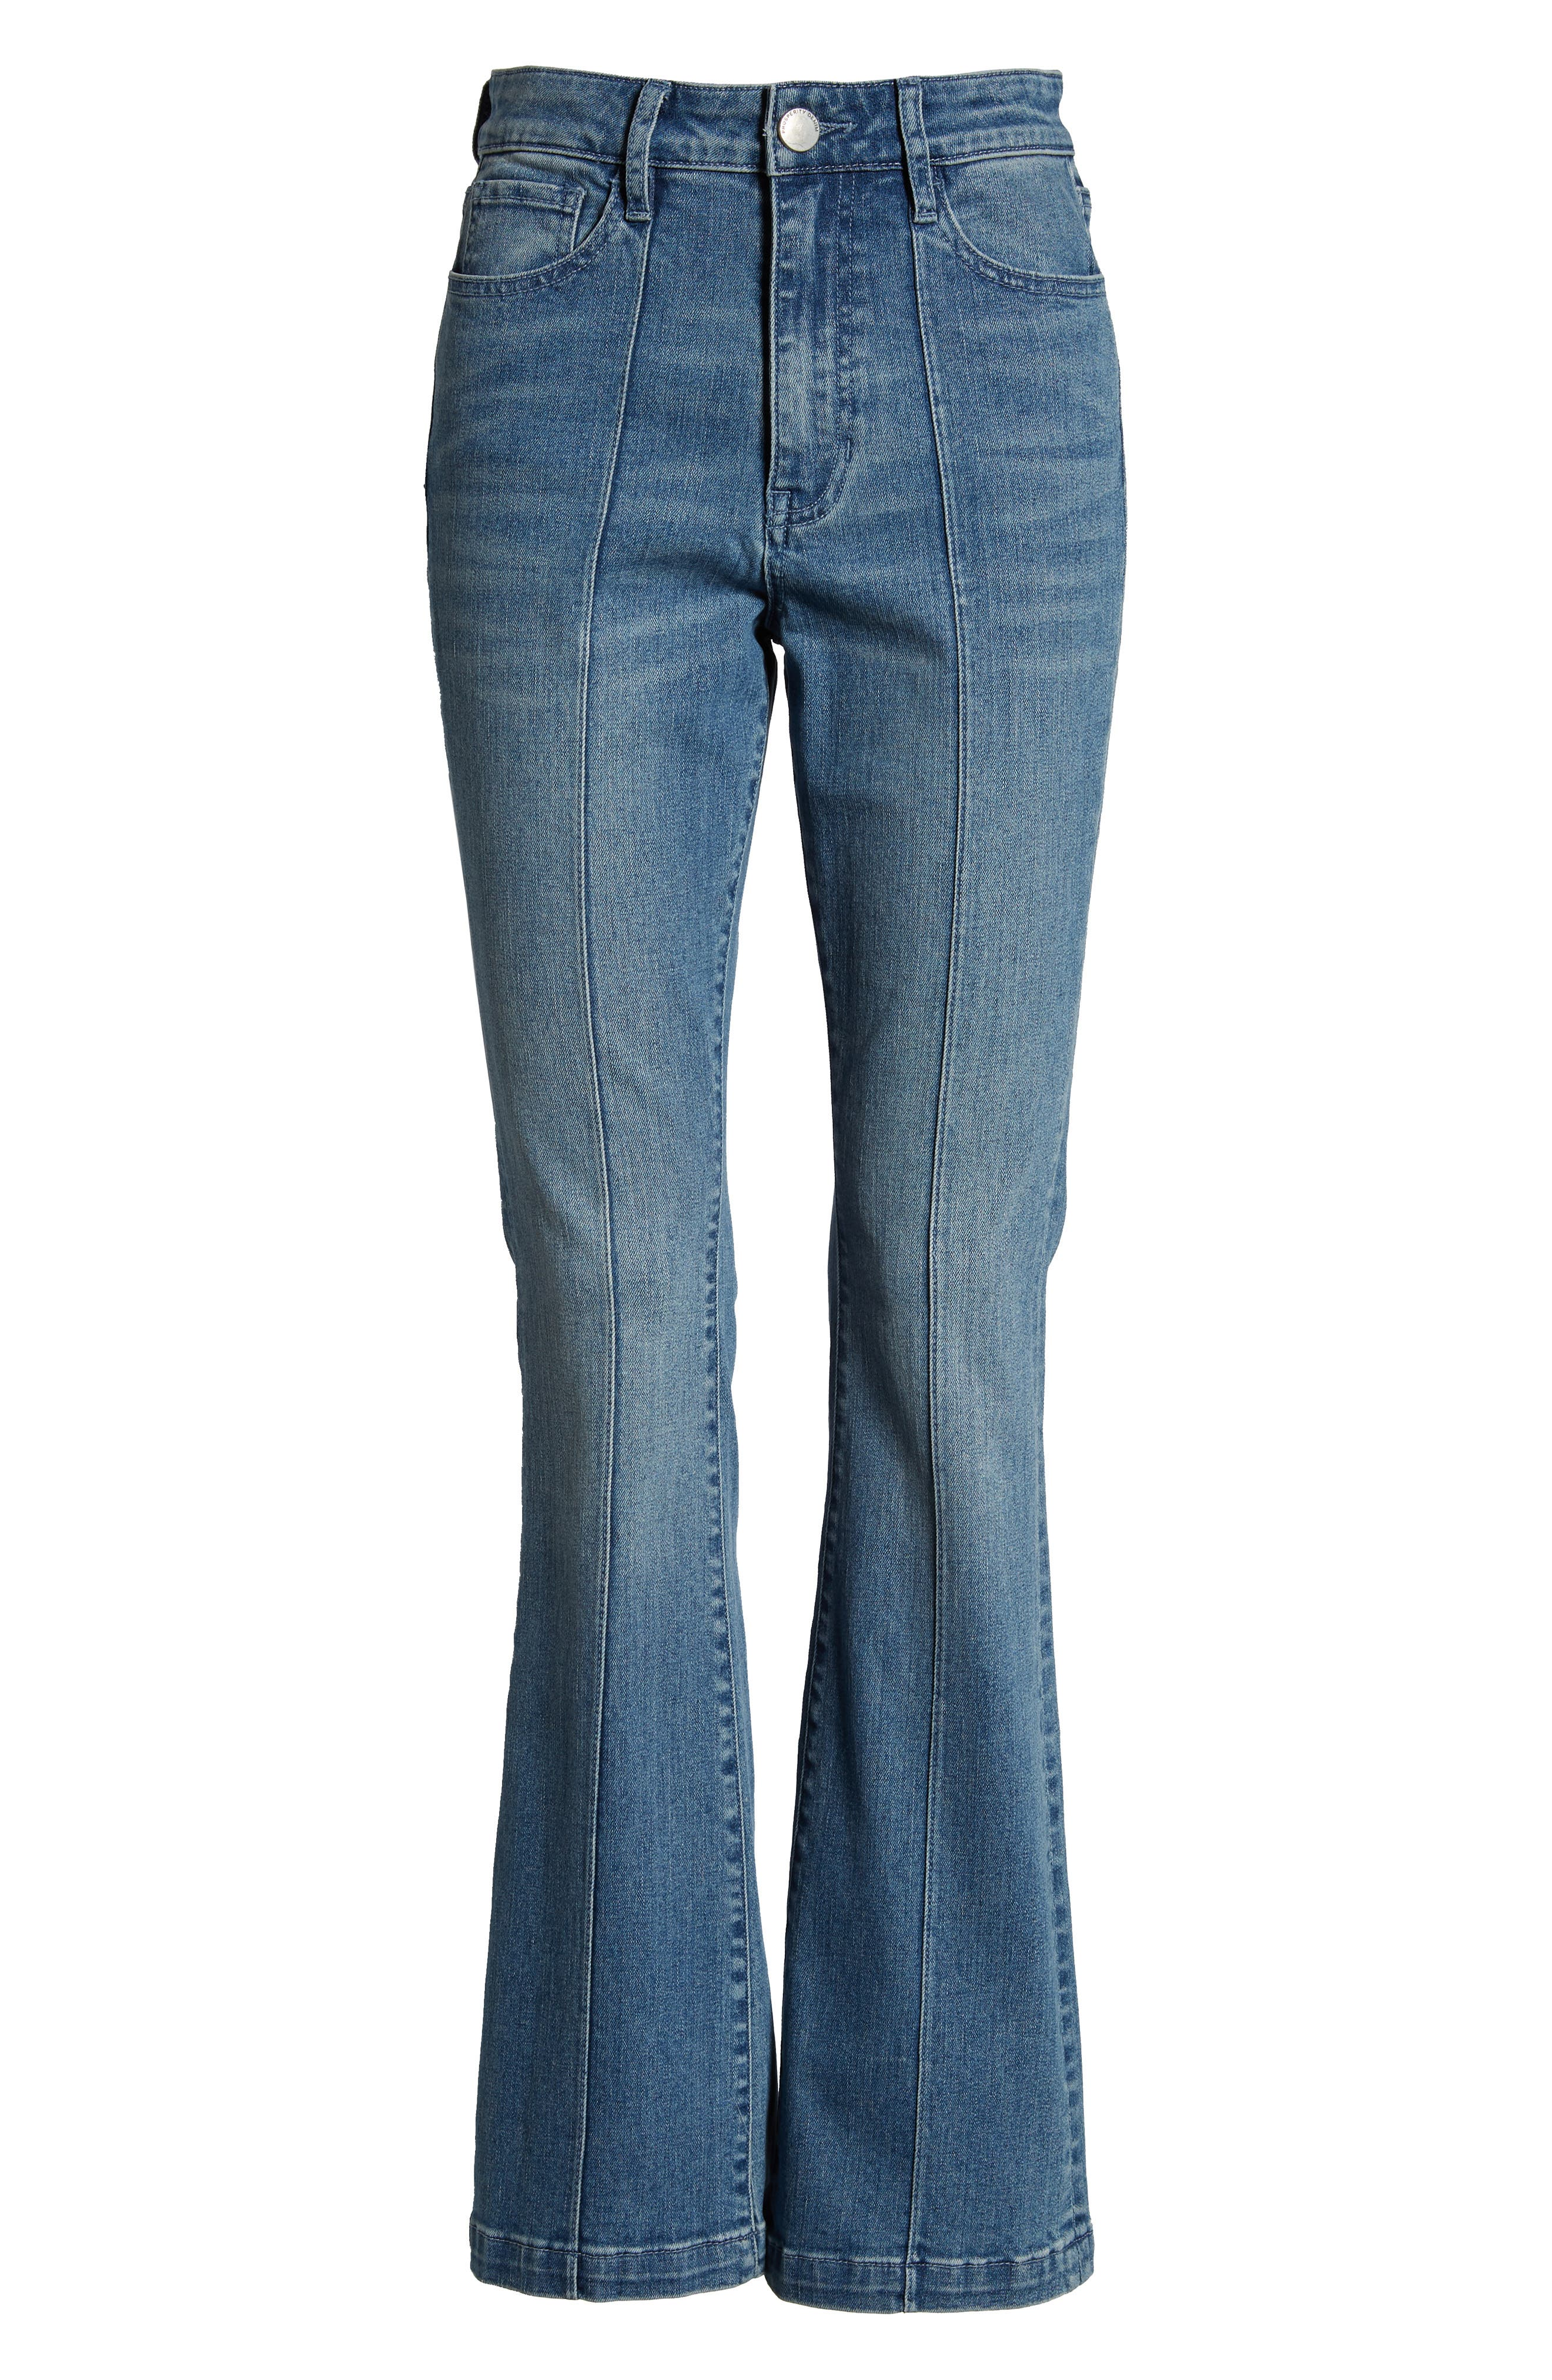 PROSPERITY DENIM, Pintuck Flare Jeans, Alternate thumbnail 7, color, KARLA WASH